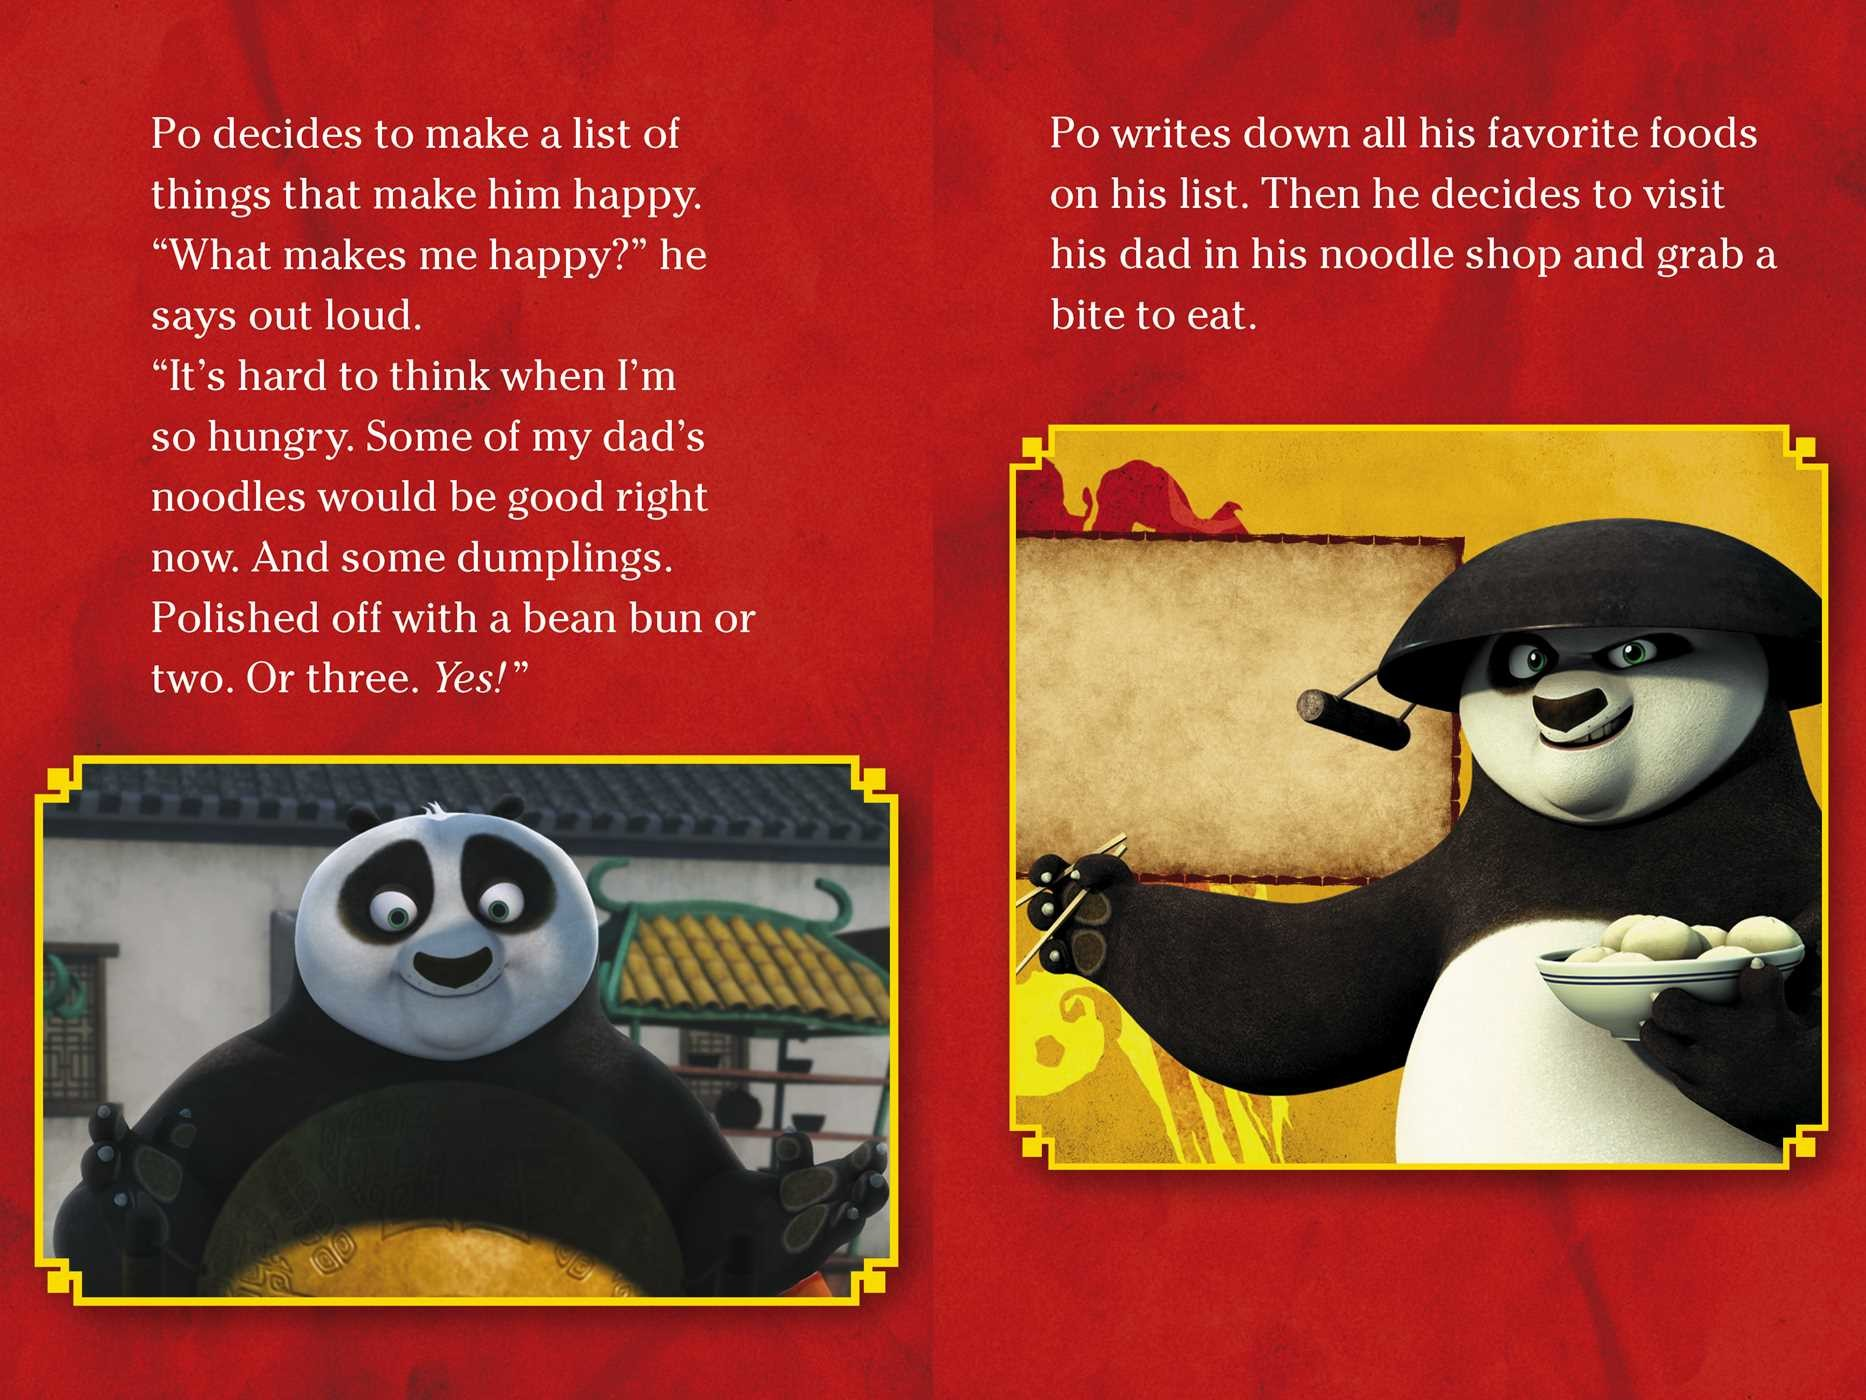 thankfulness is awesomeness part of kung fu panda tv by tina gallo